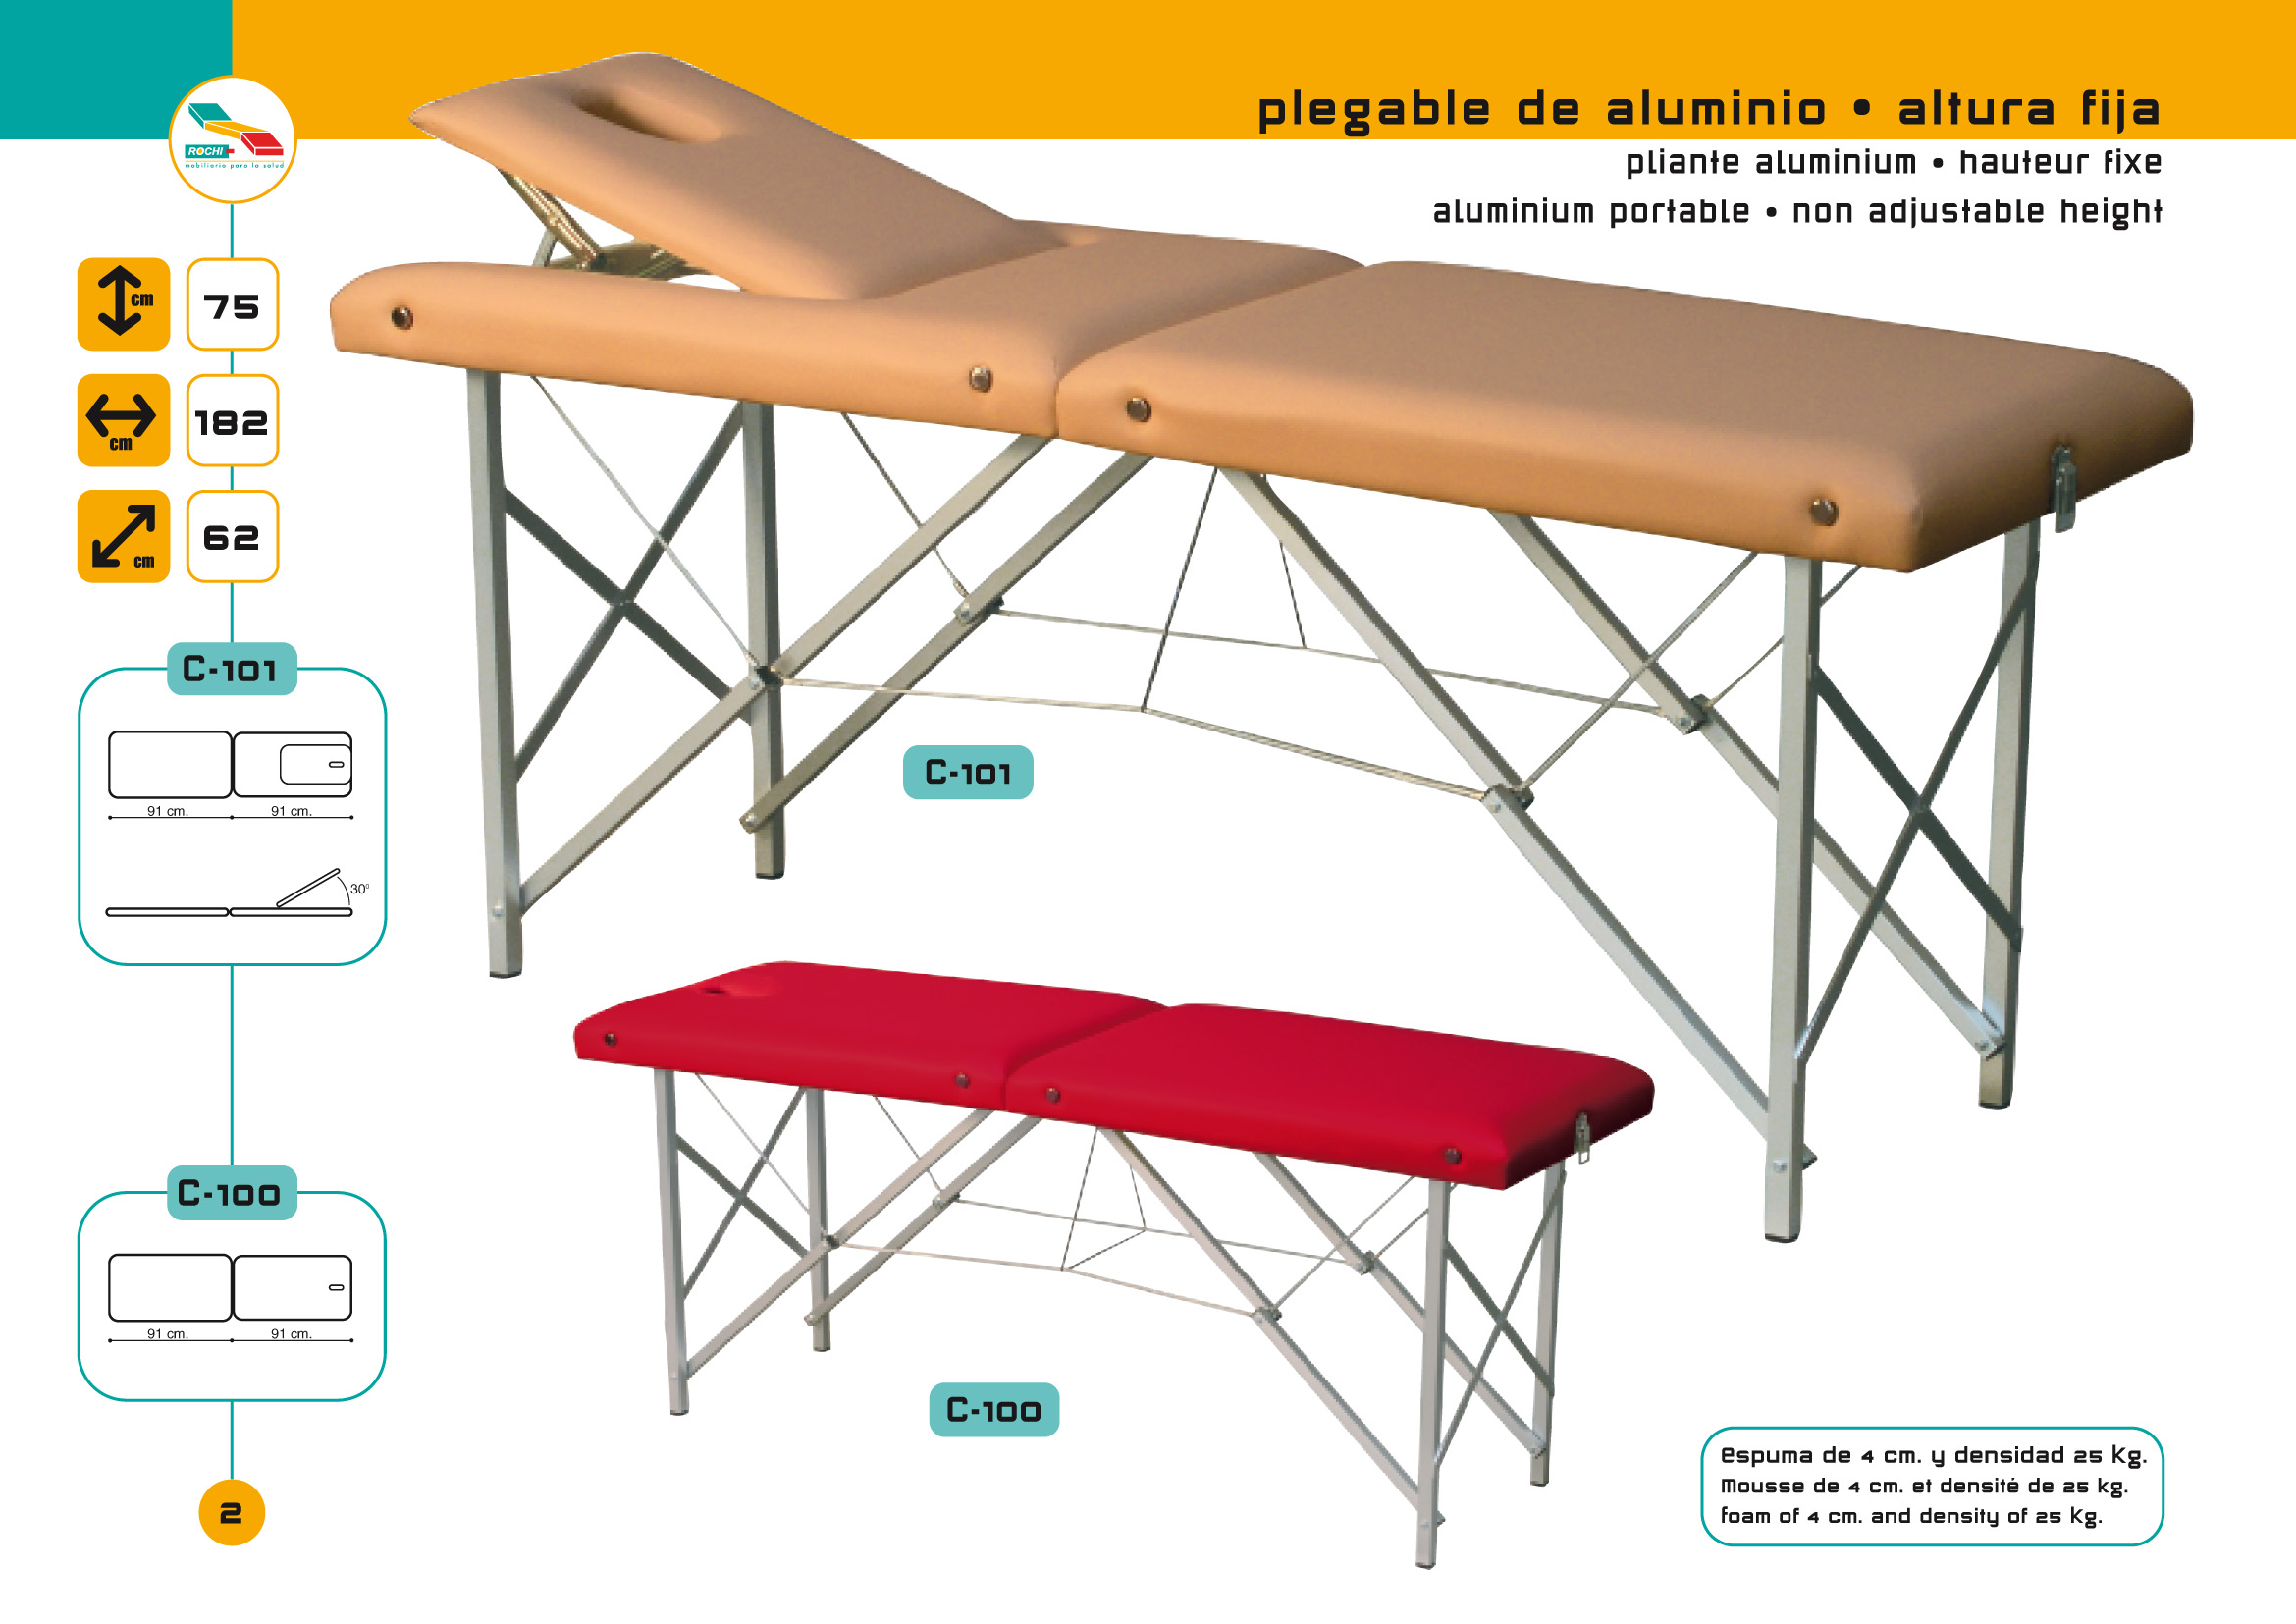 Table de massage pliante c 101 avec tendeurs - Table de massage pliante alu ...